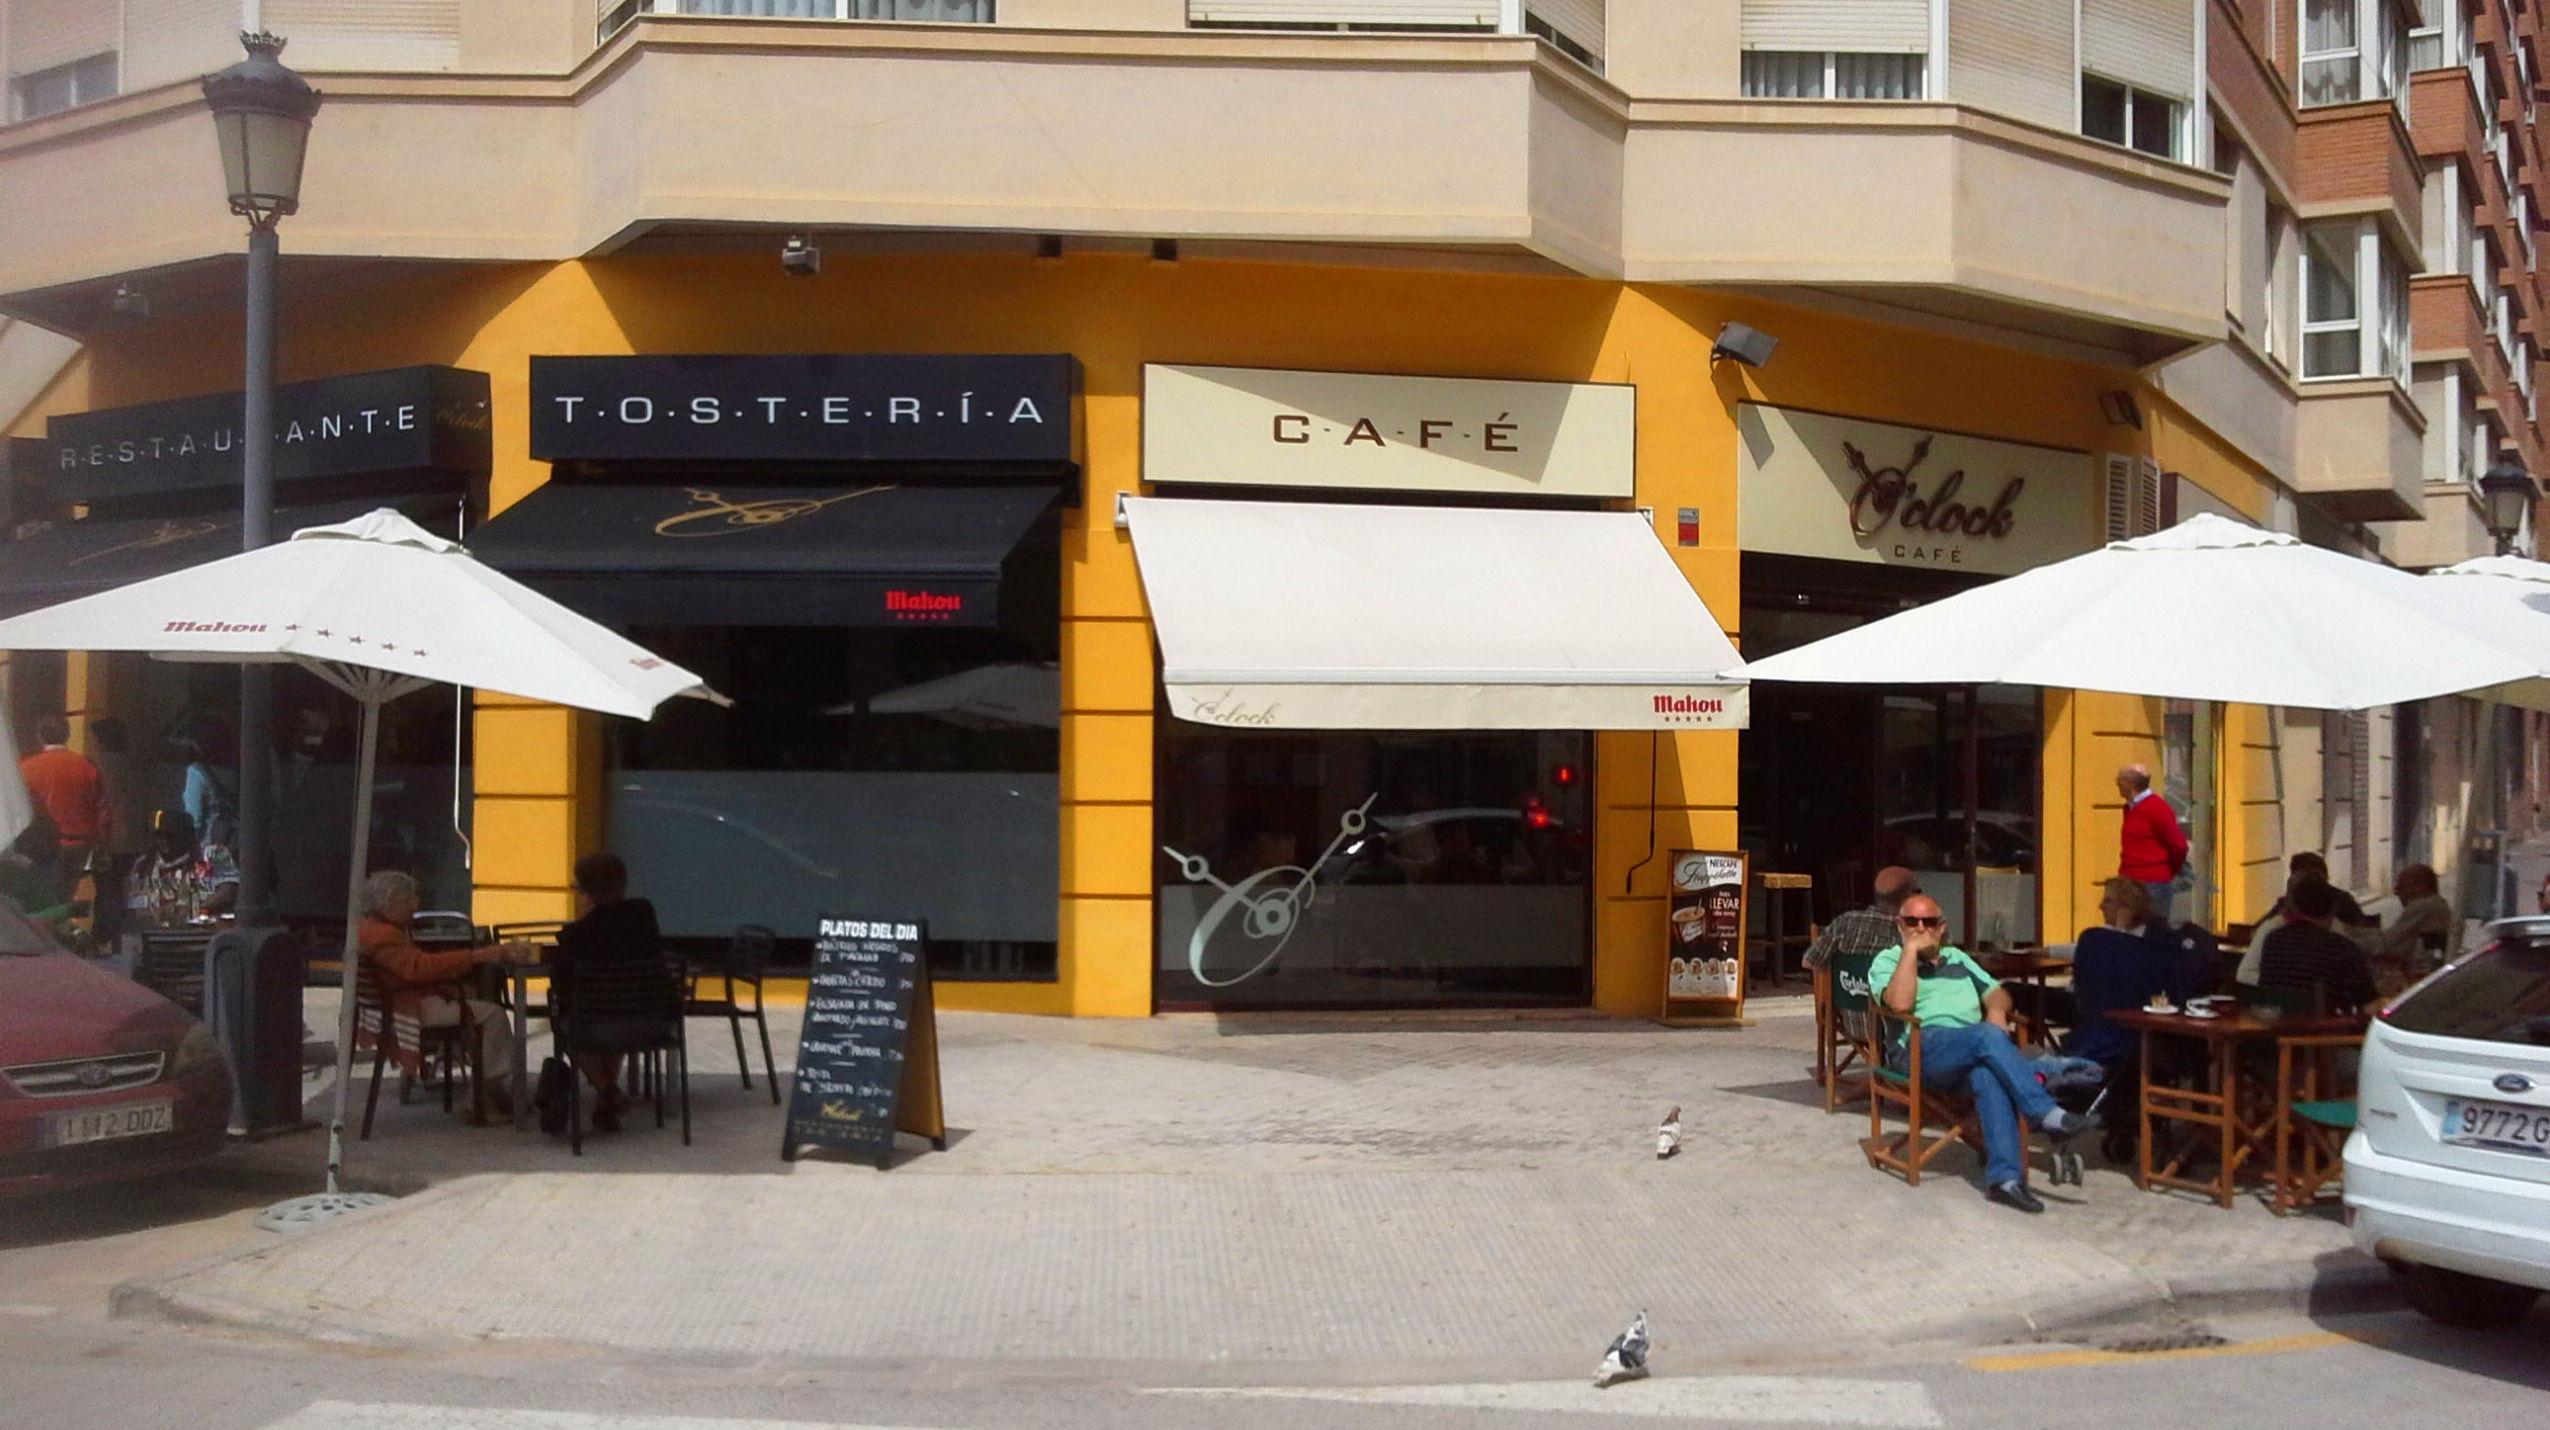 Foto 46 de Restaurante en Valencia | Cafetería Tosteria O´Clock